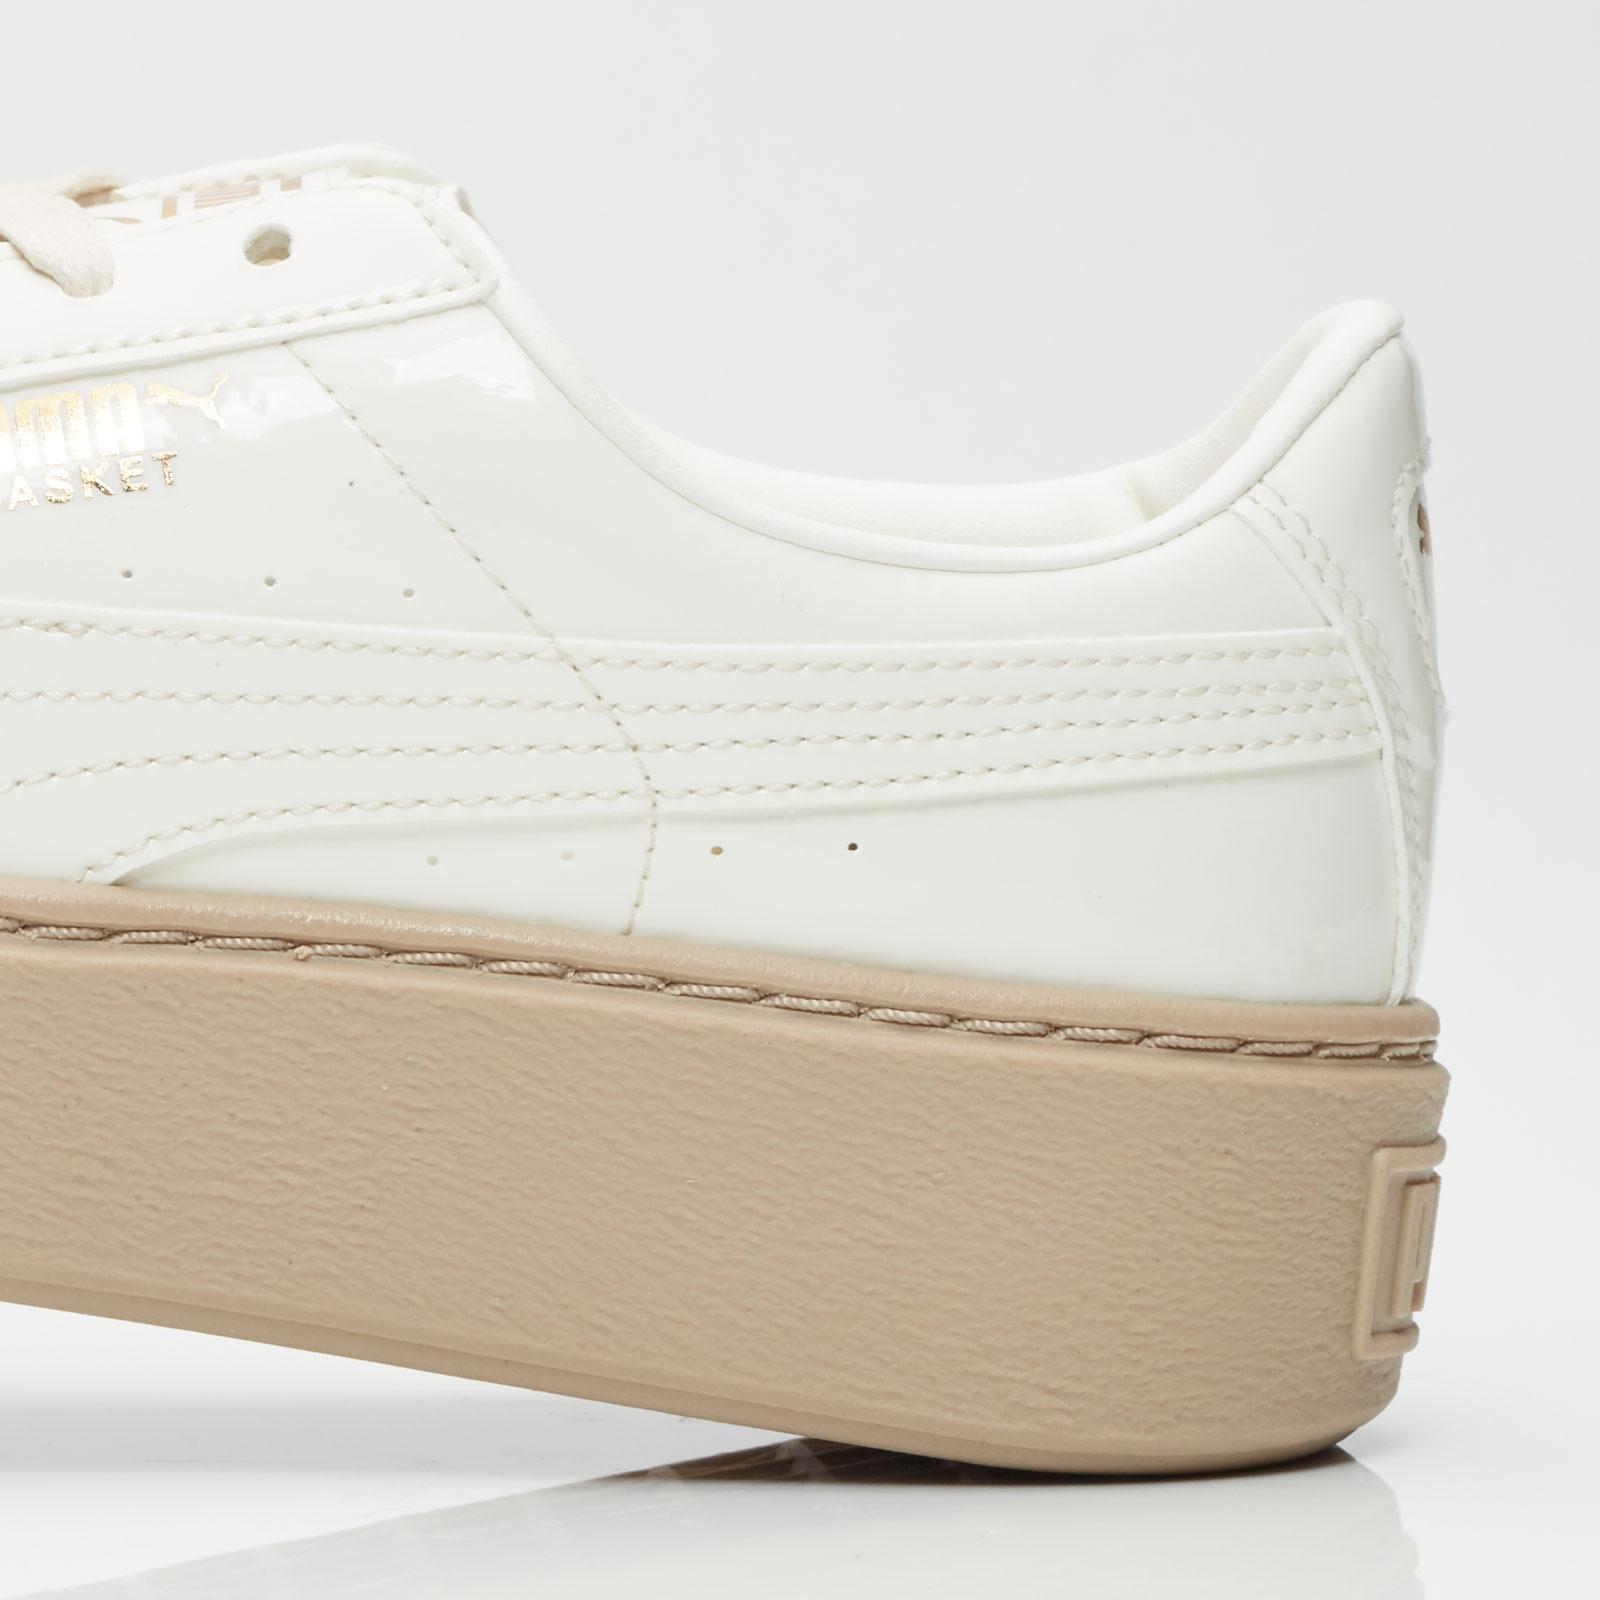 1eadacfc43ce9 Puma Platform Patent Wns - 363314-05 - Sneakersnstuff   sneakers ...